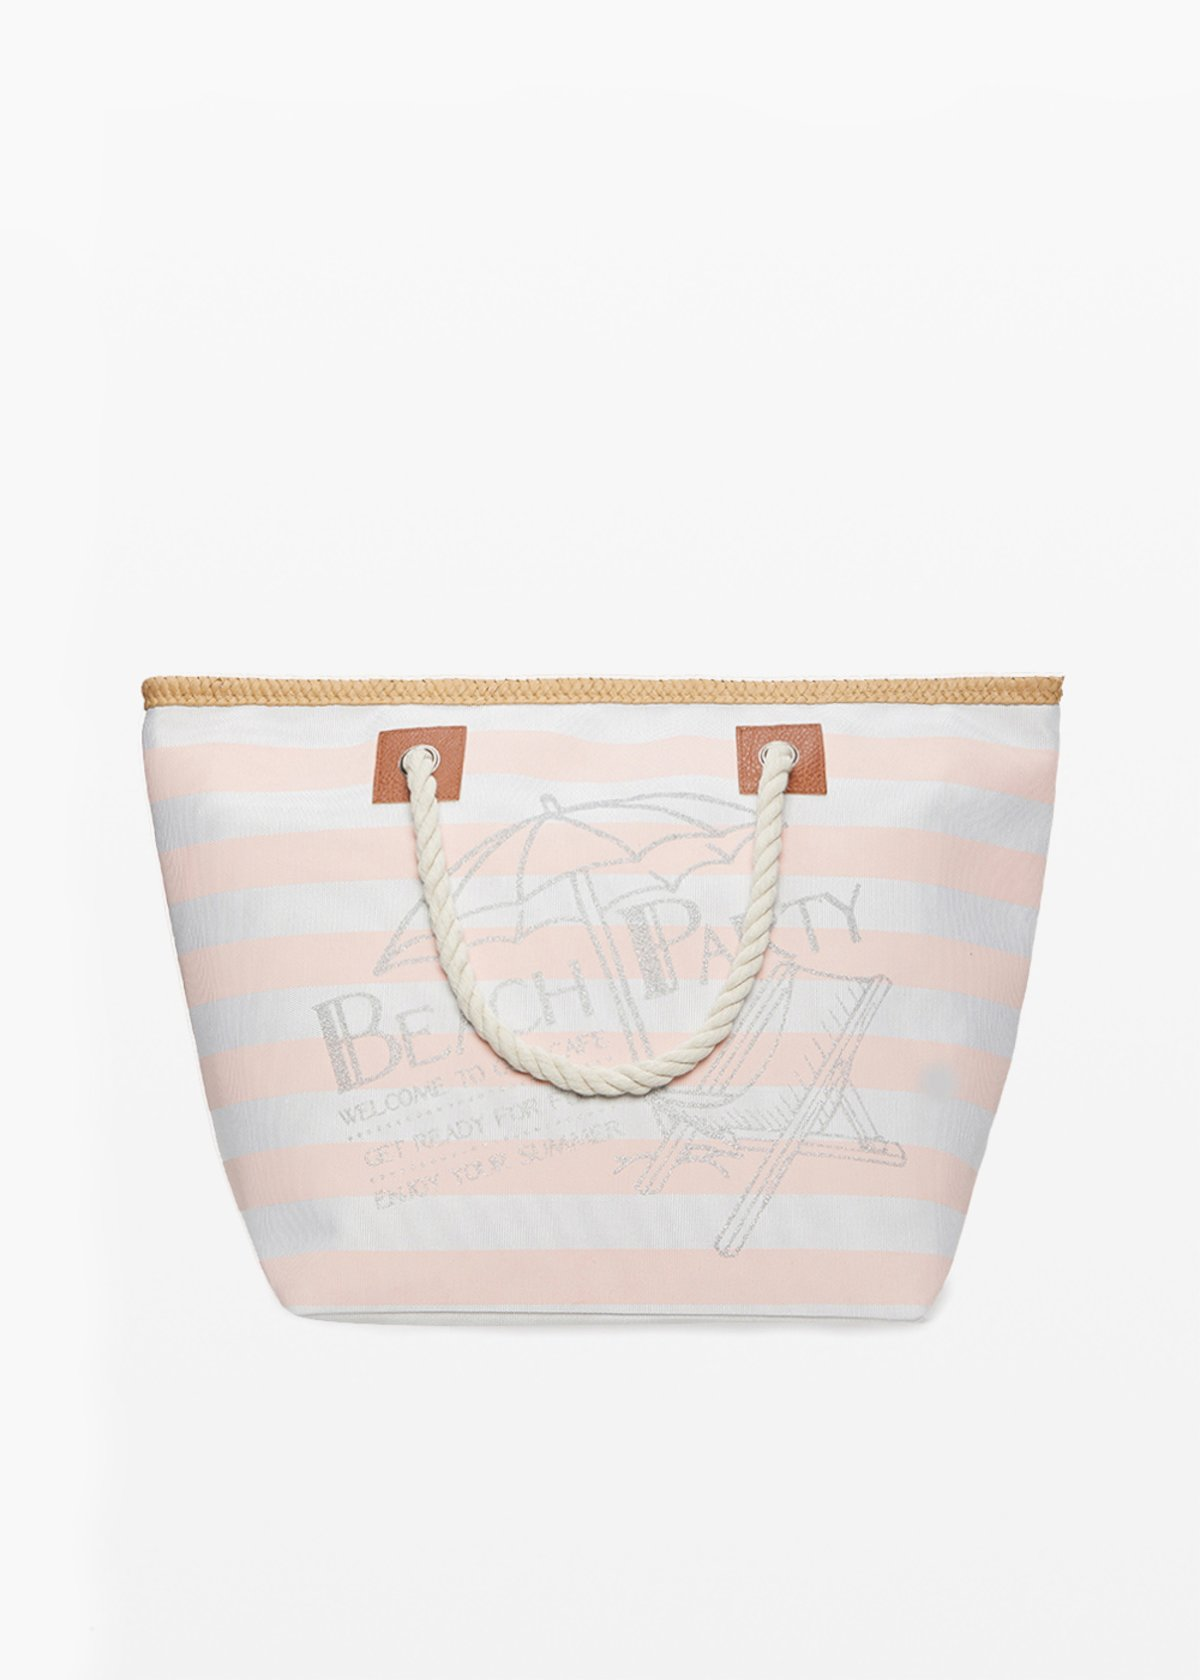 Barty stripes fantasy shopping bag with straw profiles - Oca Stripes - Woman